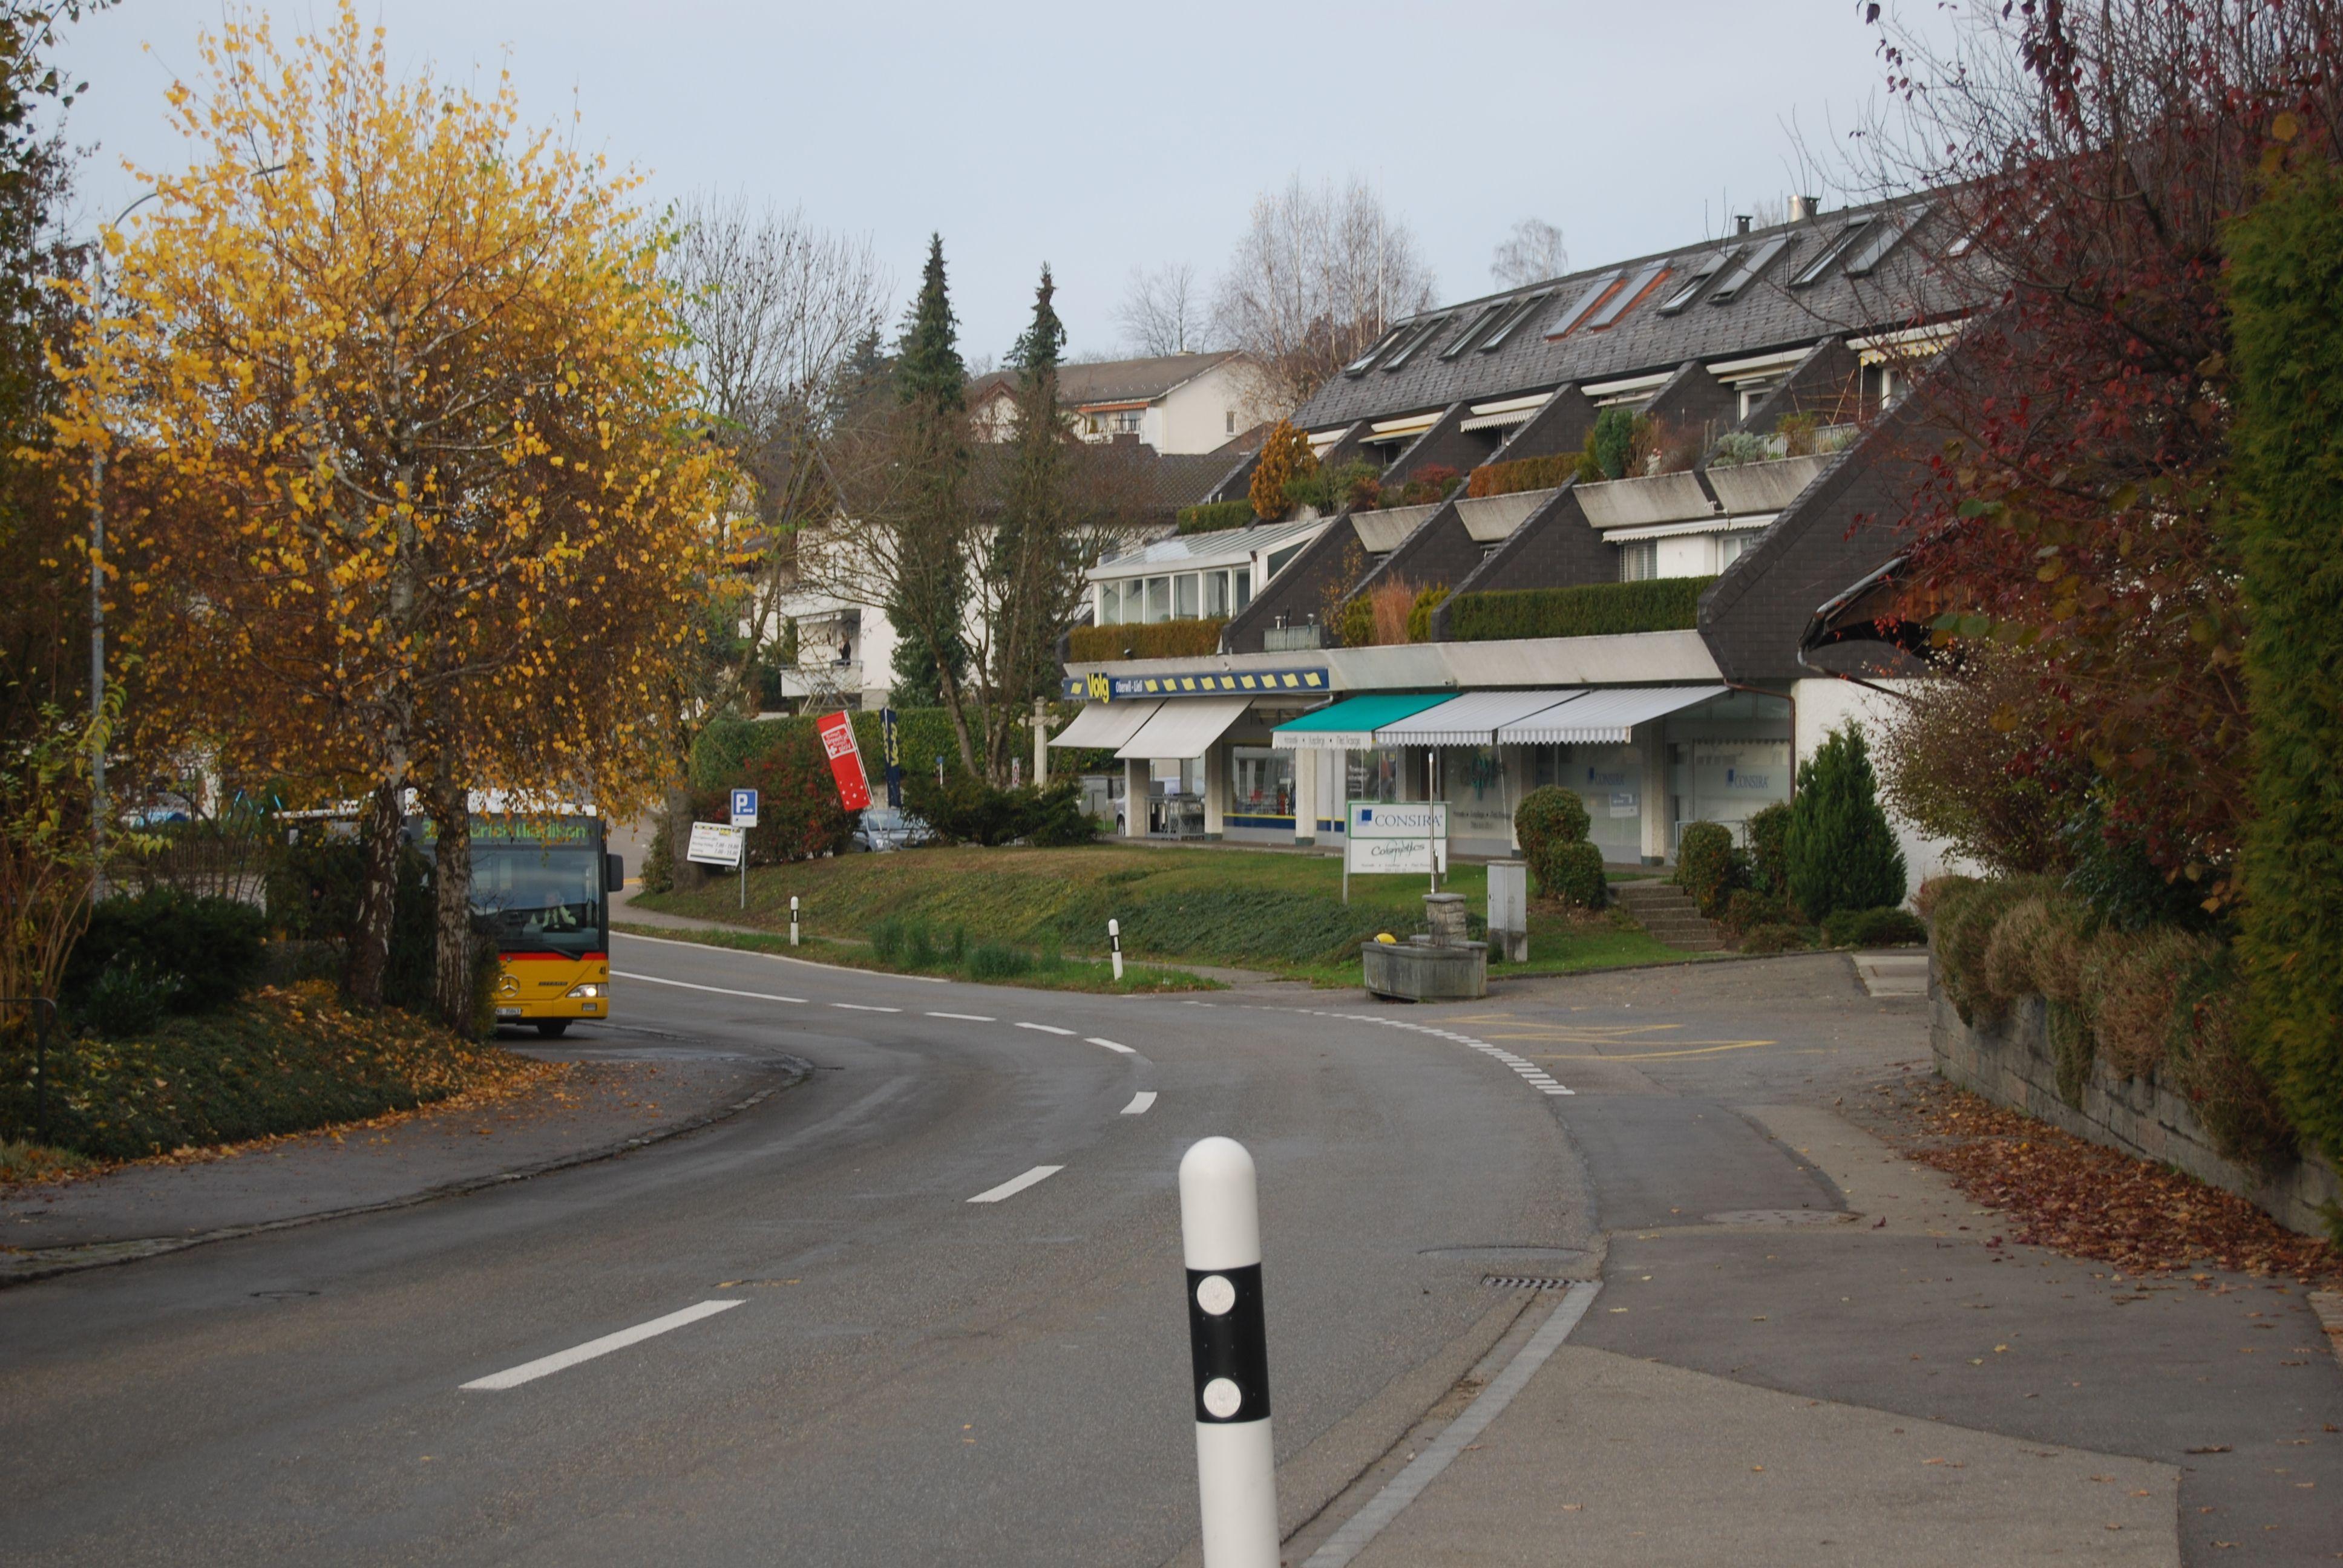 vila dos milionarios Oberwil-Lieli suiça